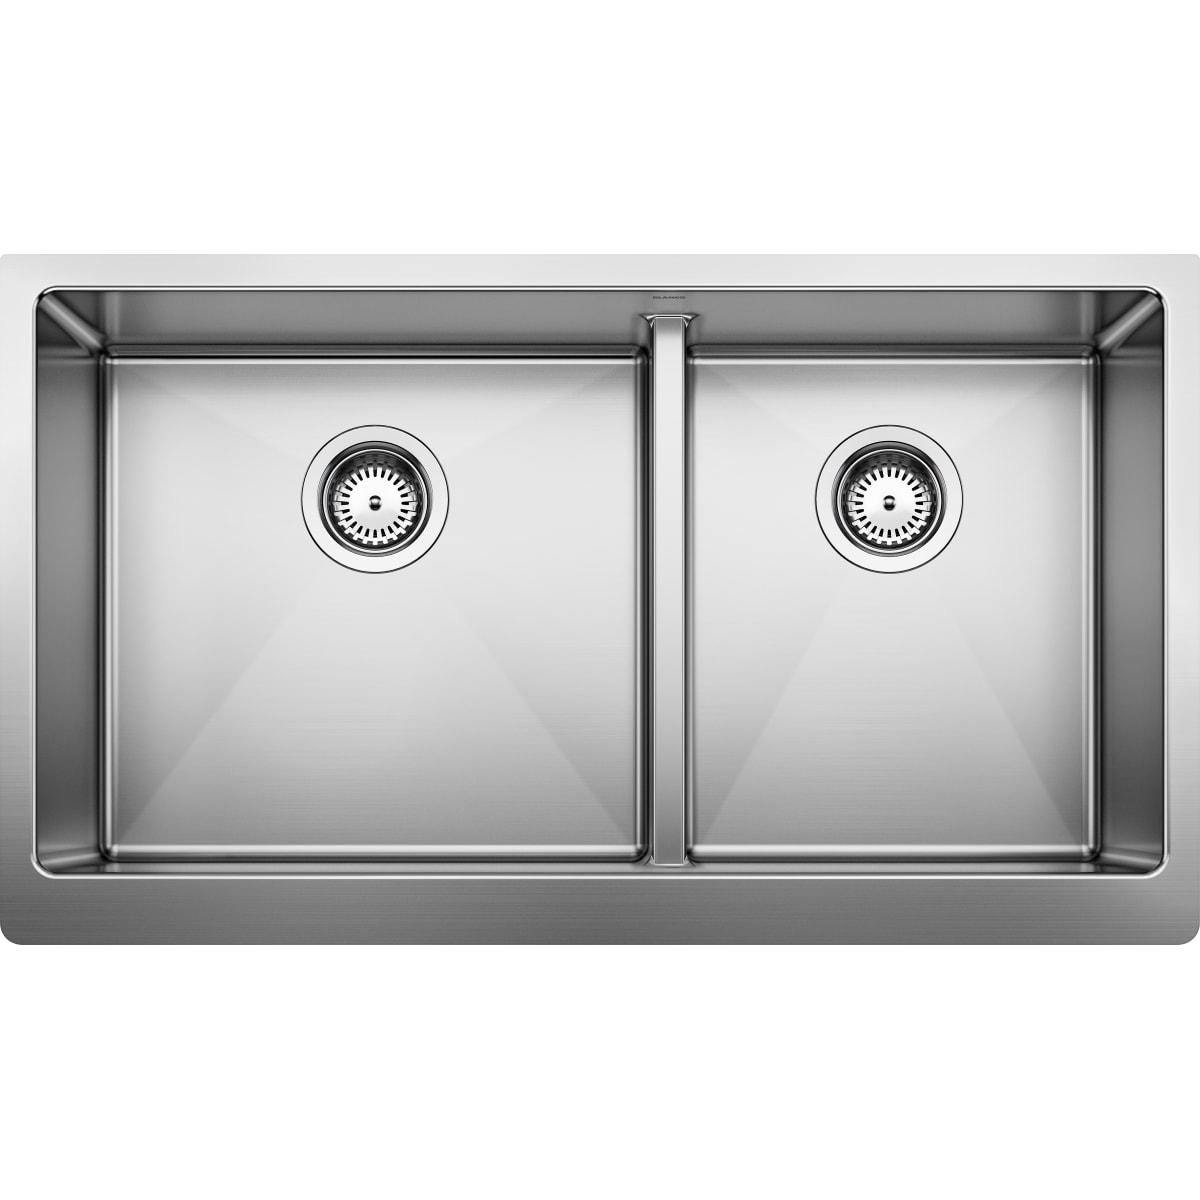 "Blanco Quatrus 33"" Farmhouse Double Basin Stainless Steel Kitchen Sink"